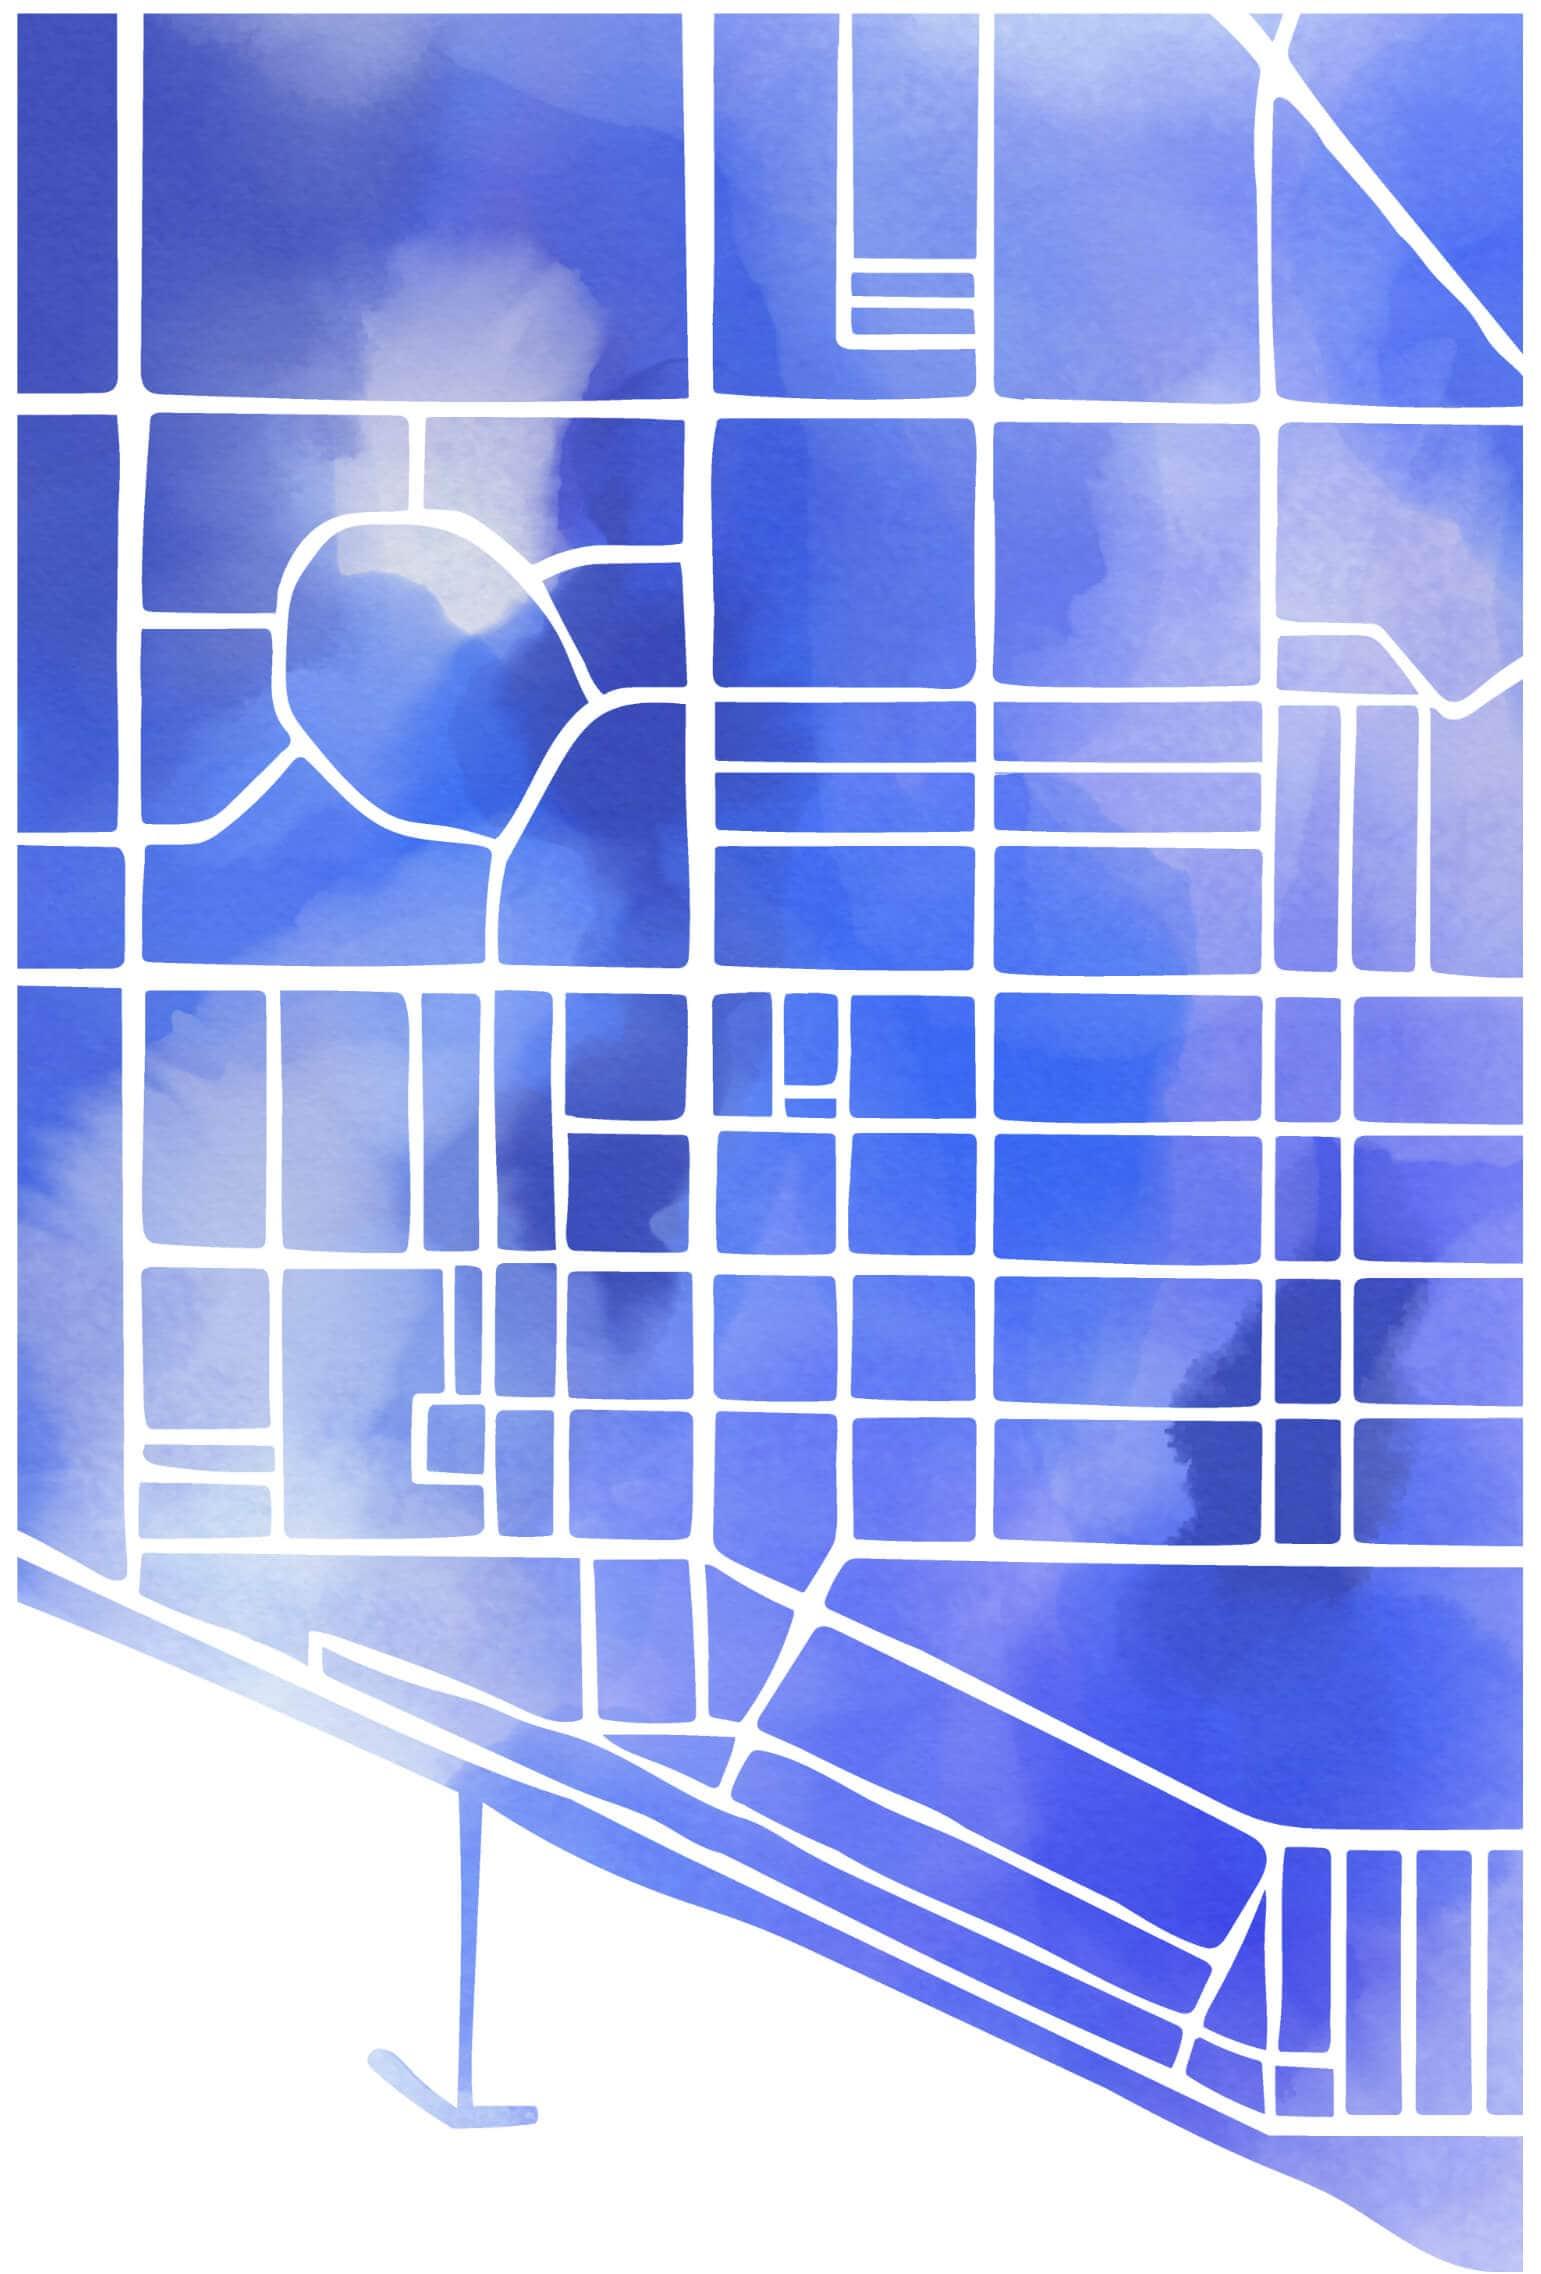 Map tileset